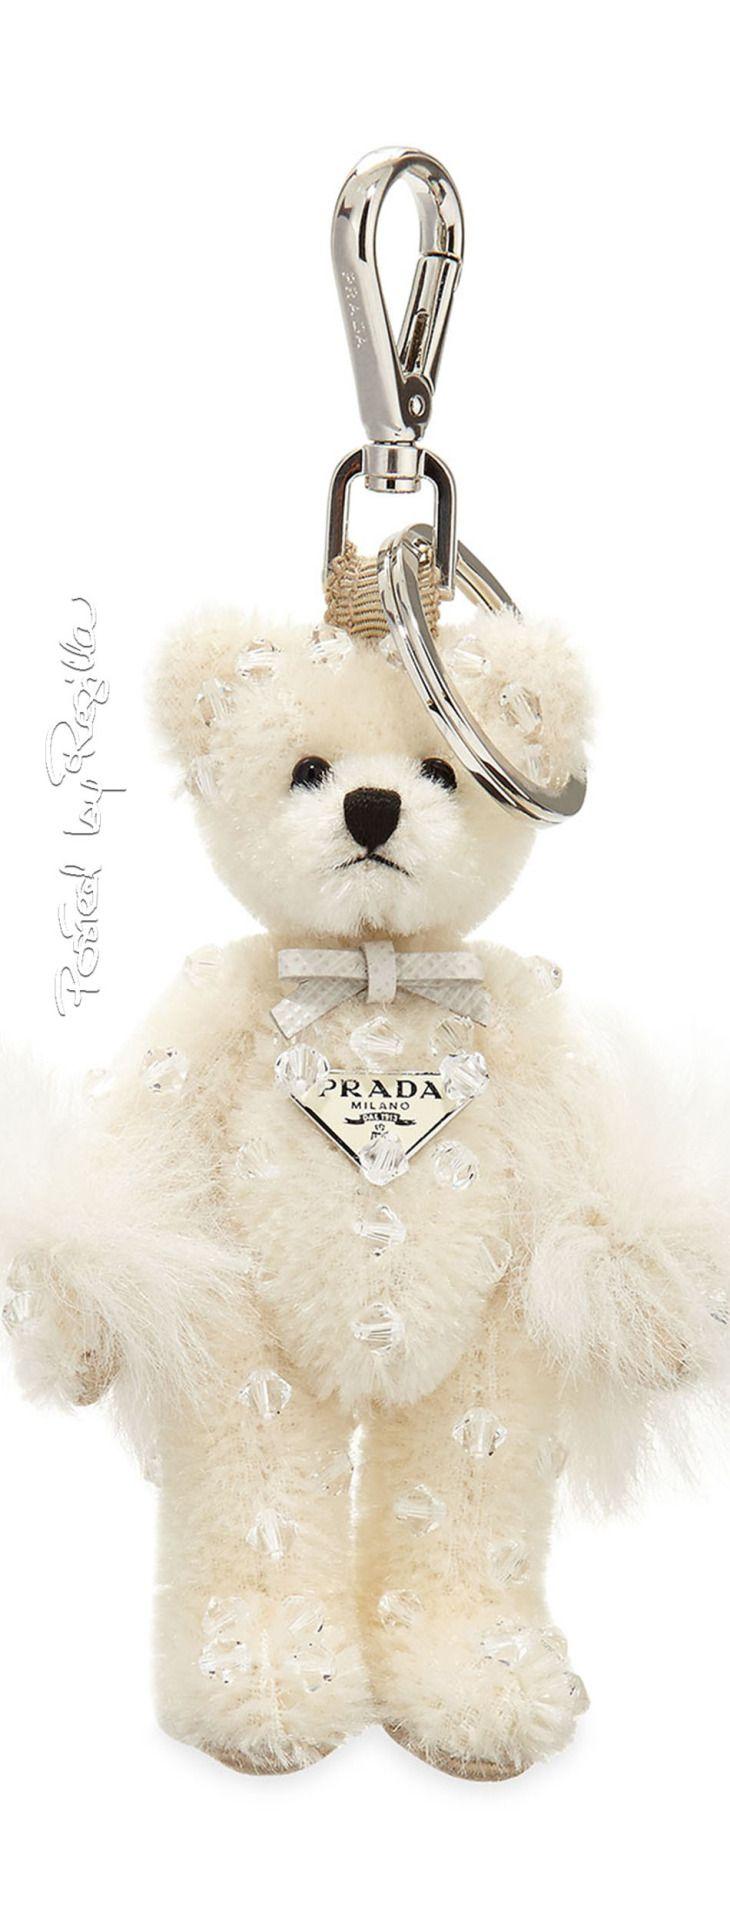 Regilla ⚜ Una Fiorentina in California   Prada, fuzzy teddy bear handbag chram